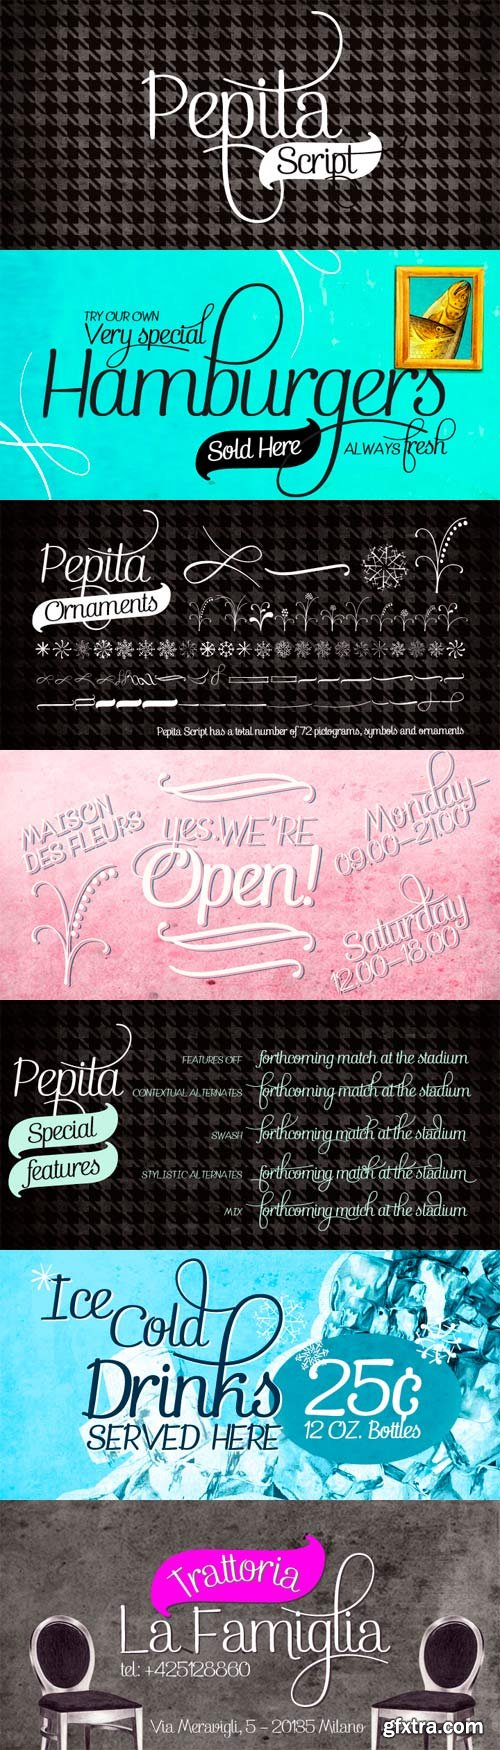 Pepita Script Font Family - 6 Fonts for $60